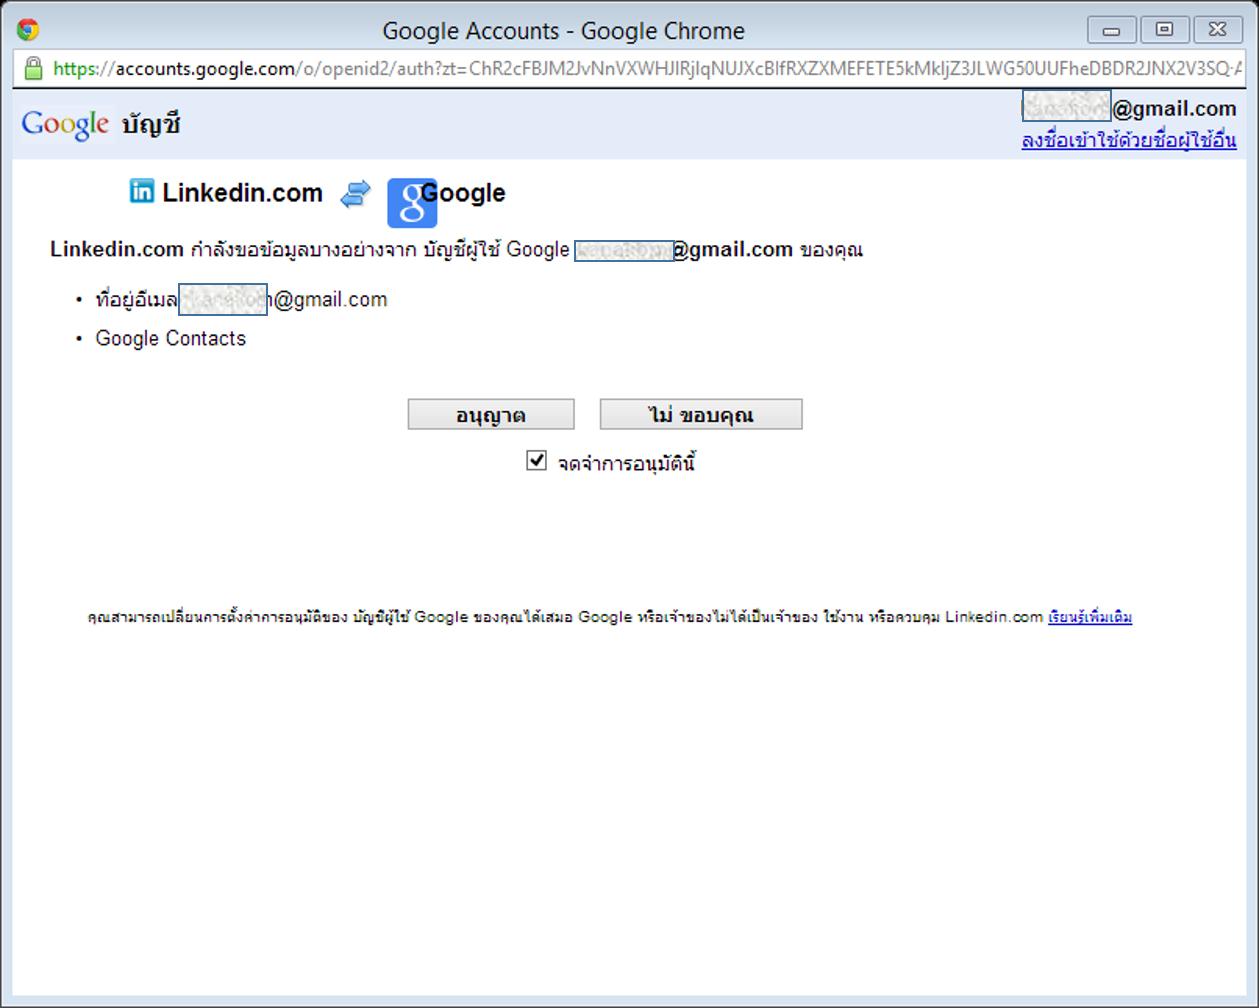 06-LinkedIn-gmailcontact